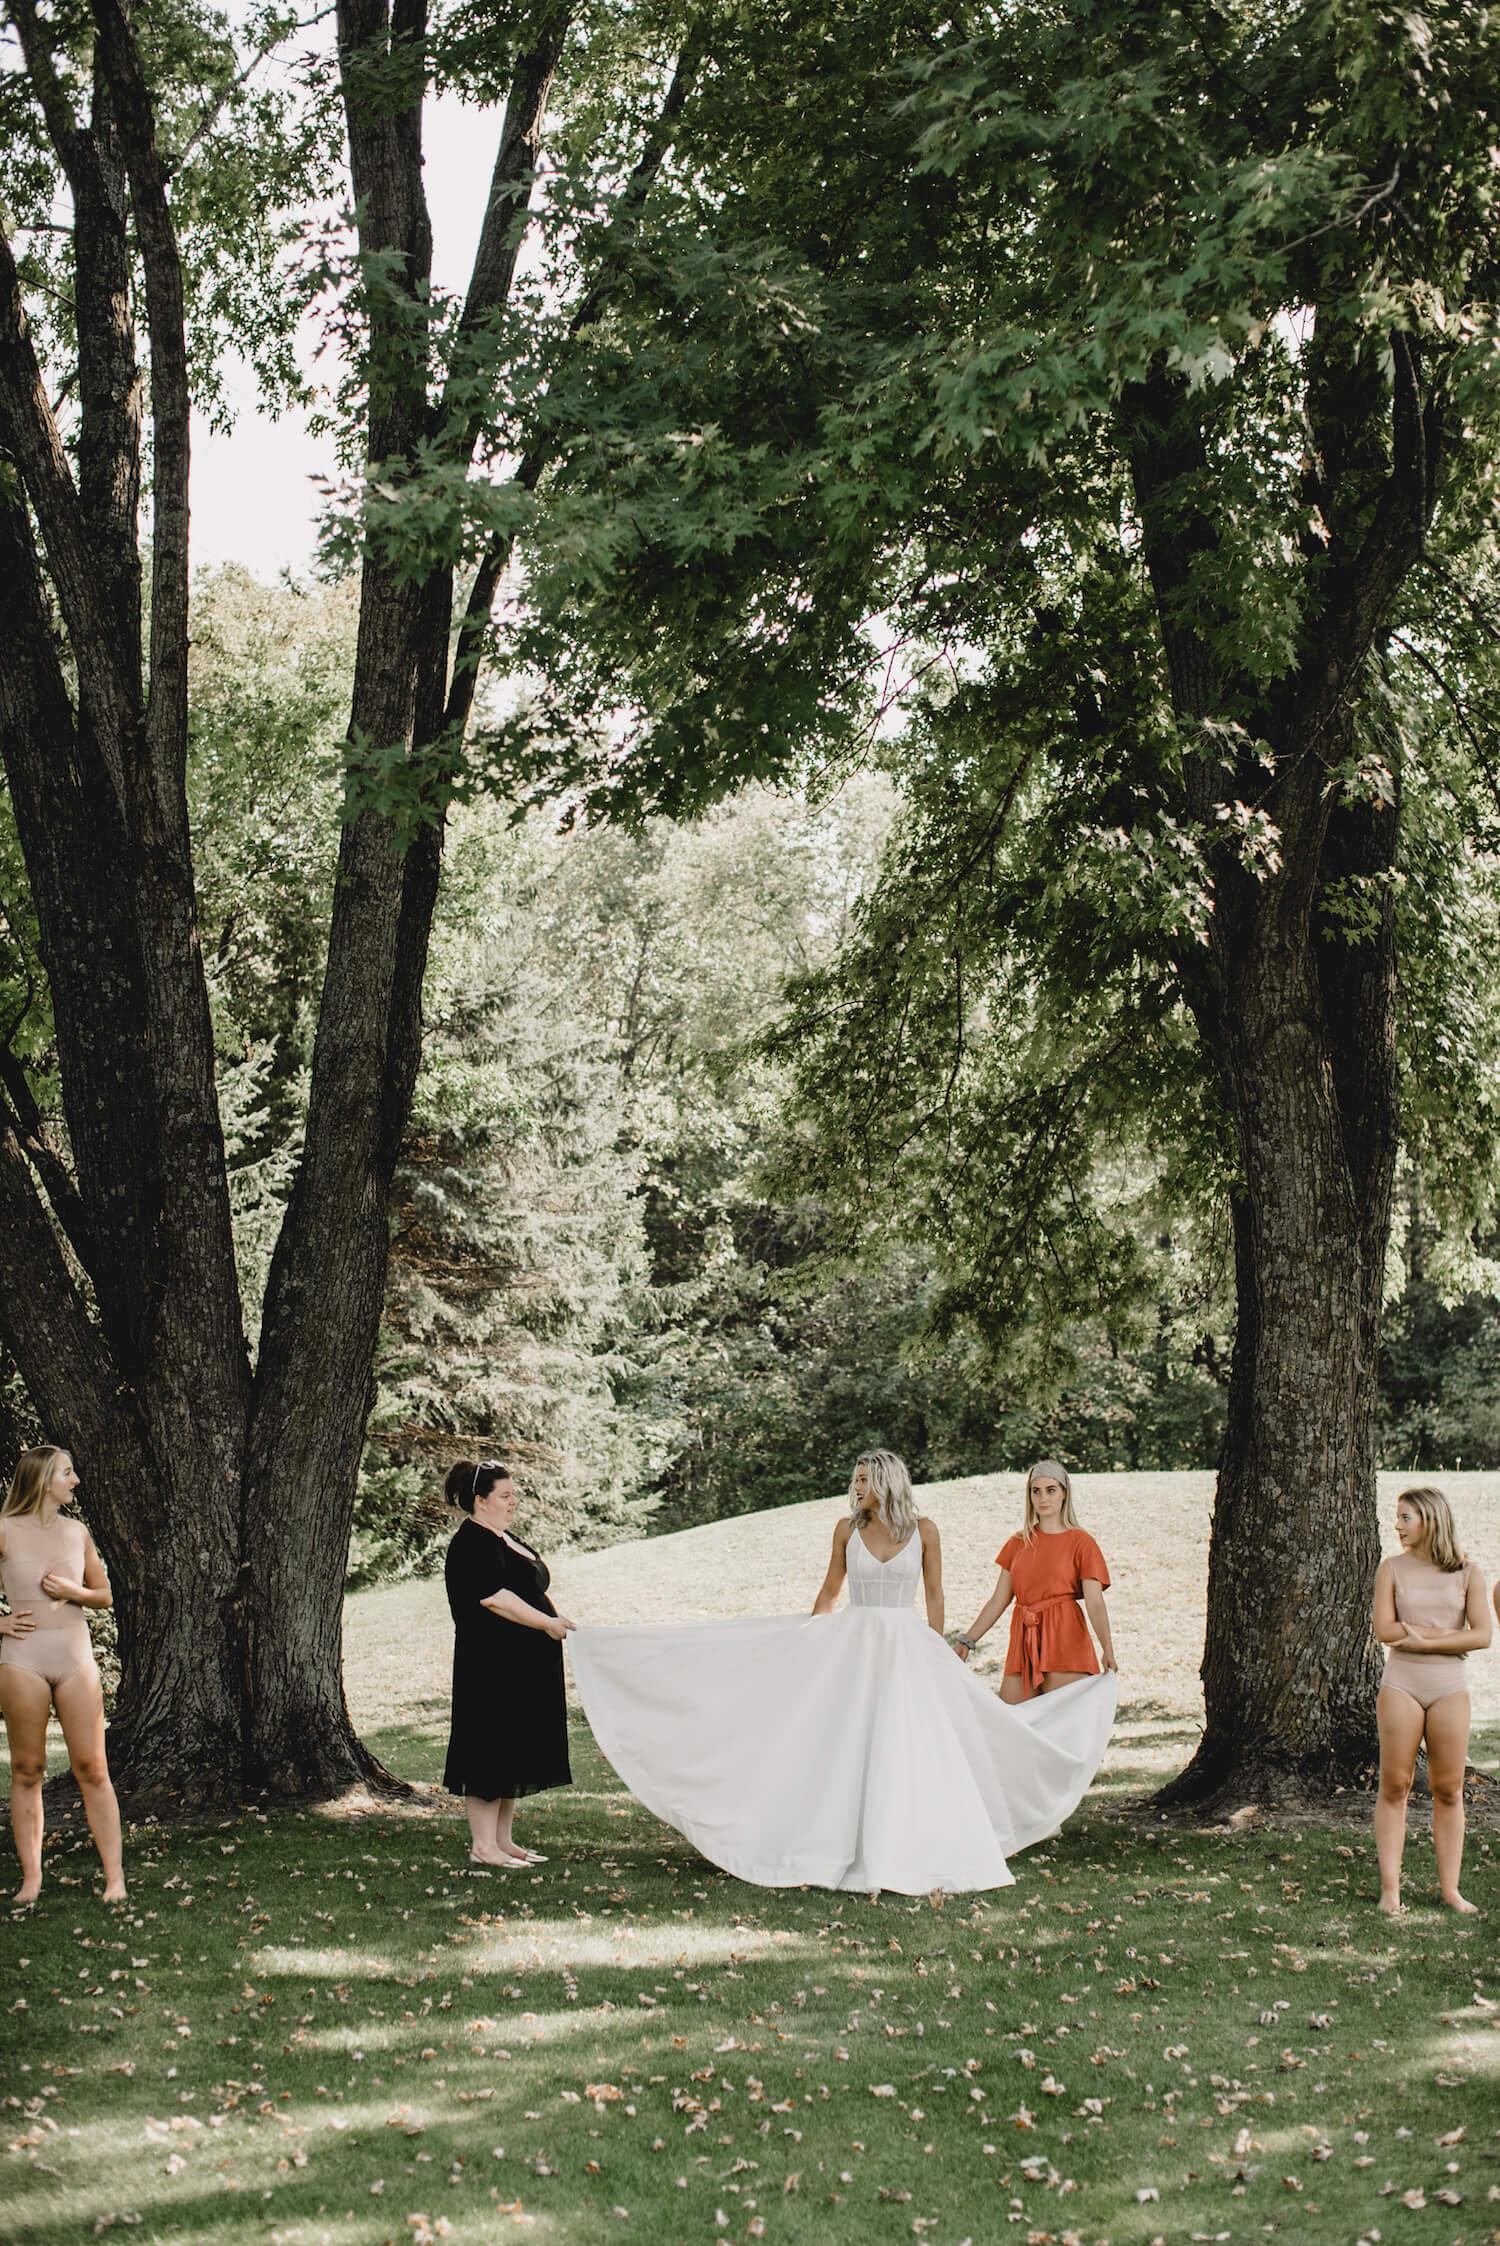 acowsay-cinema-tara-latour-wedding-designer-bts- (52 of 124).jpg